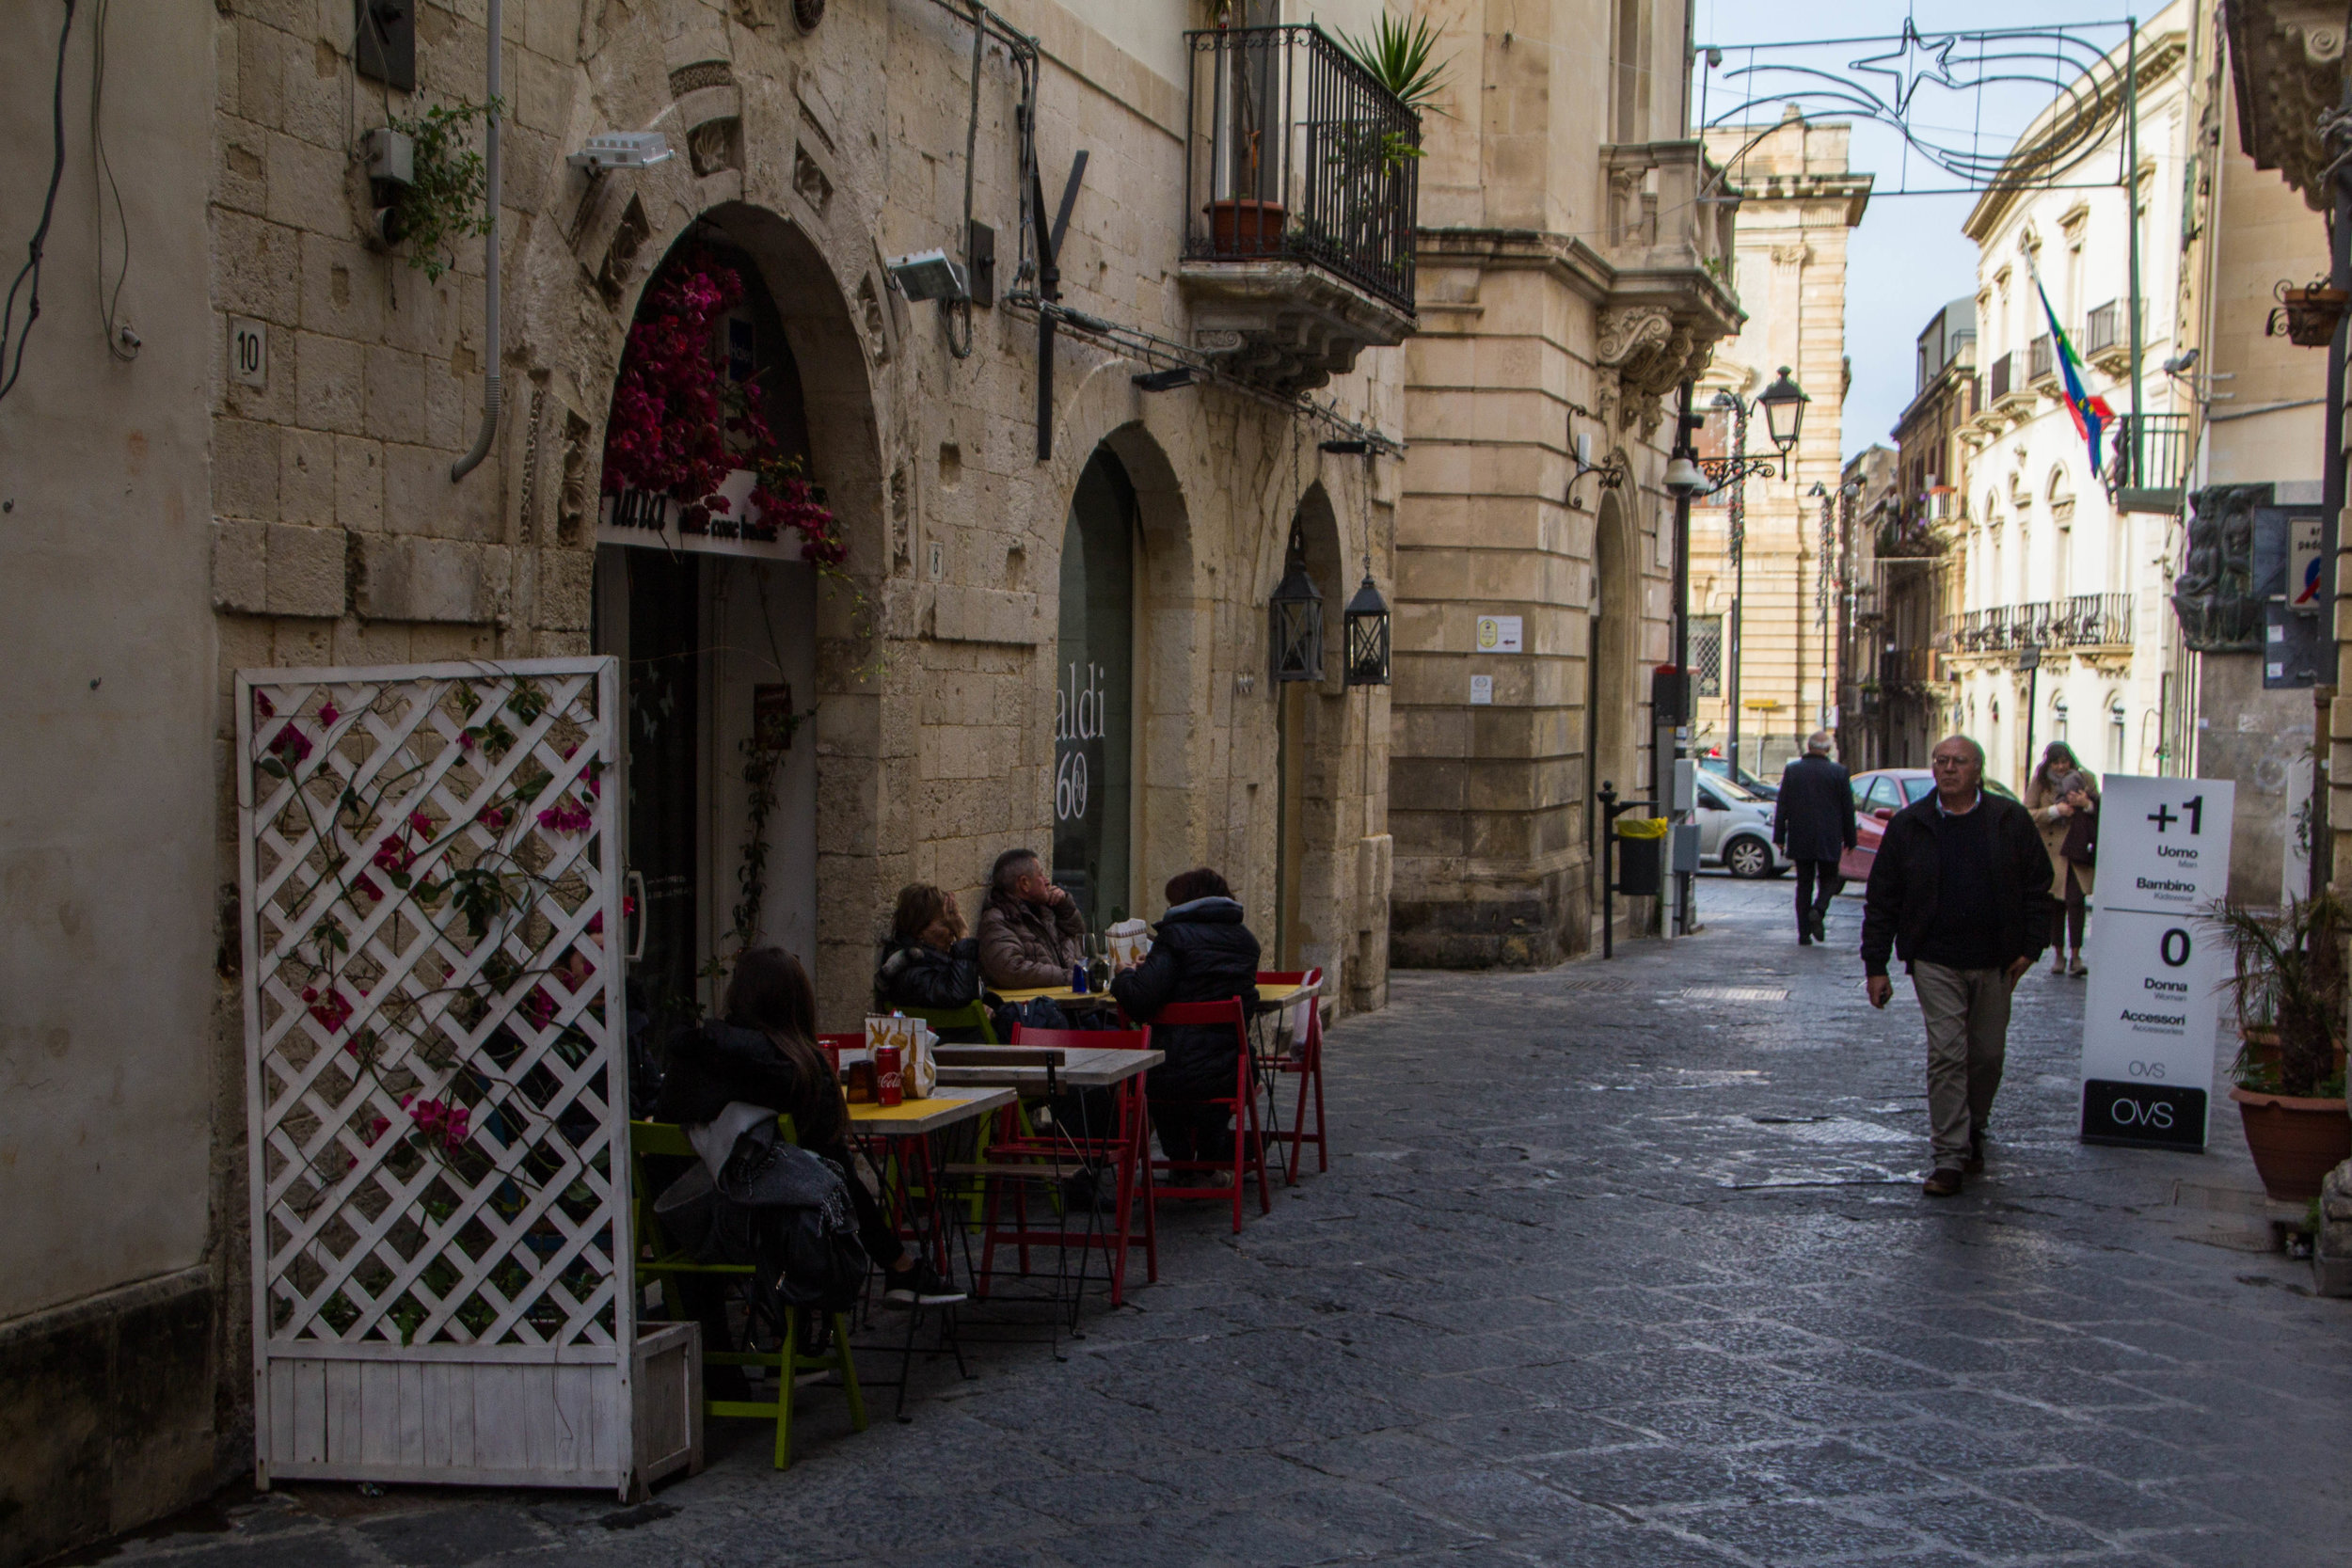 streets-ortygia-syracuse-sicily-44.jpg